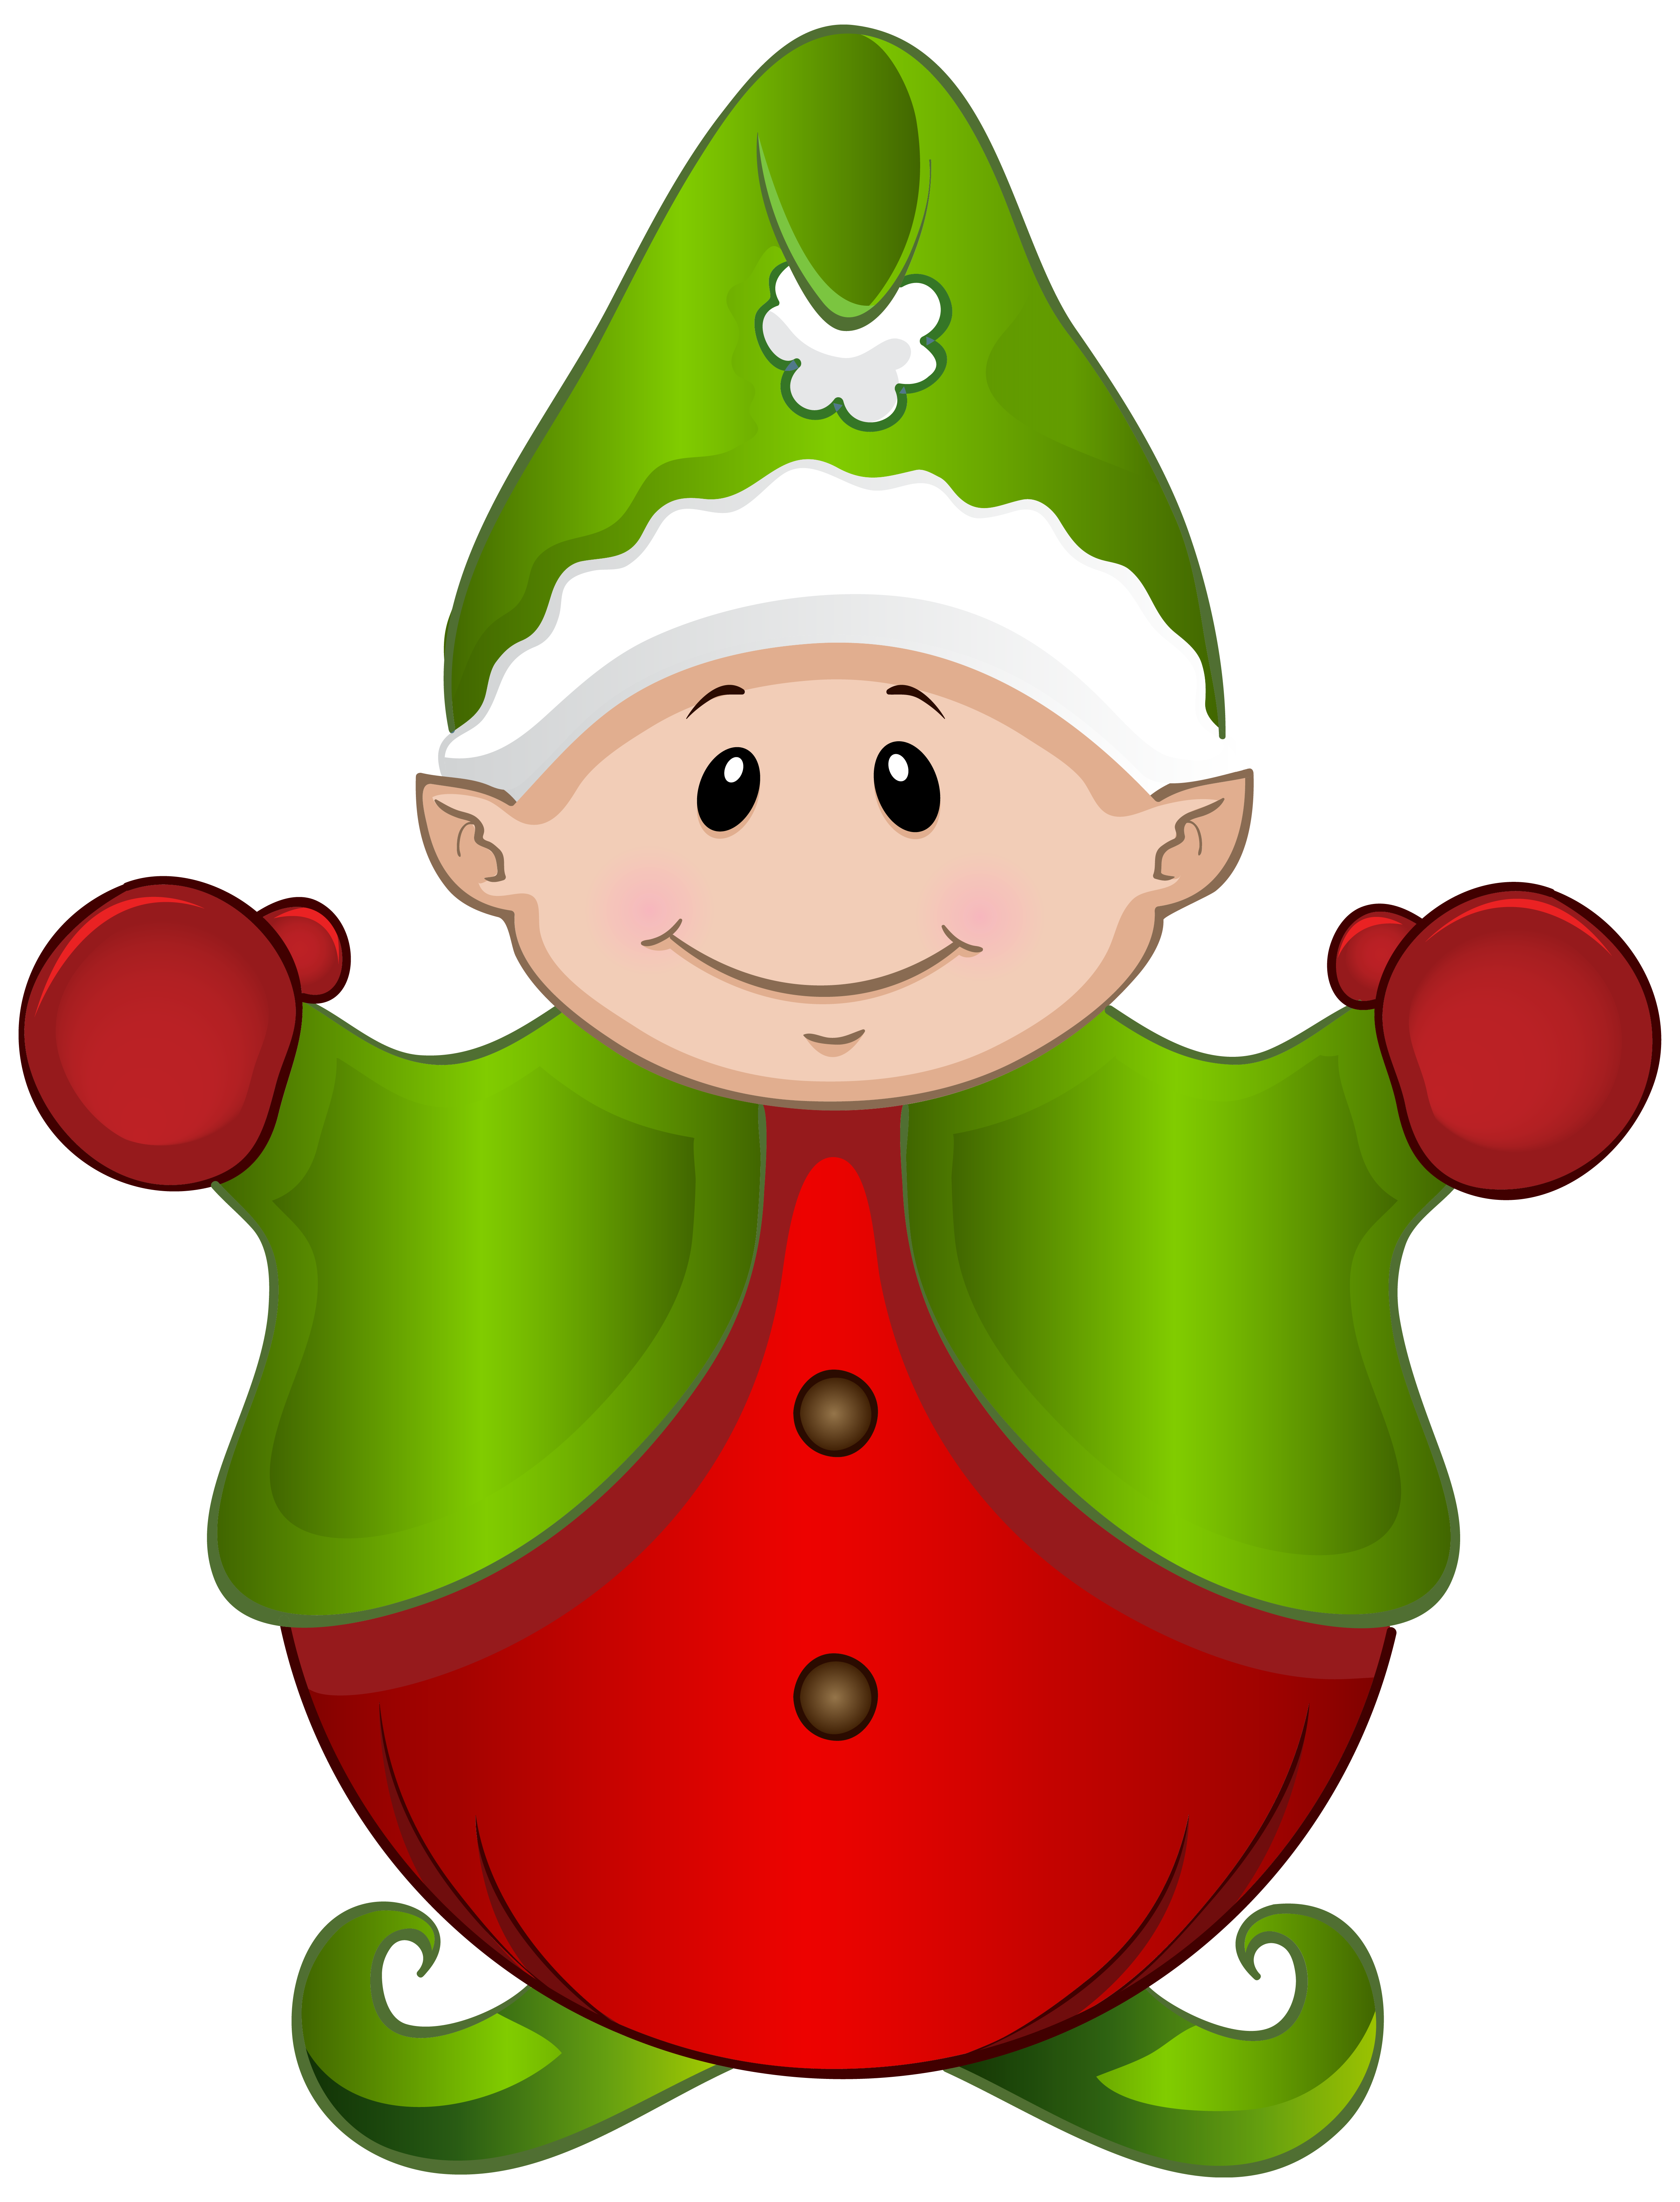 Cute Elf PNG Clipart Image.